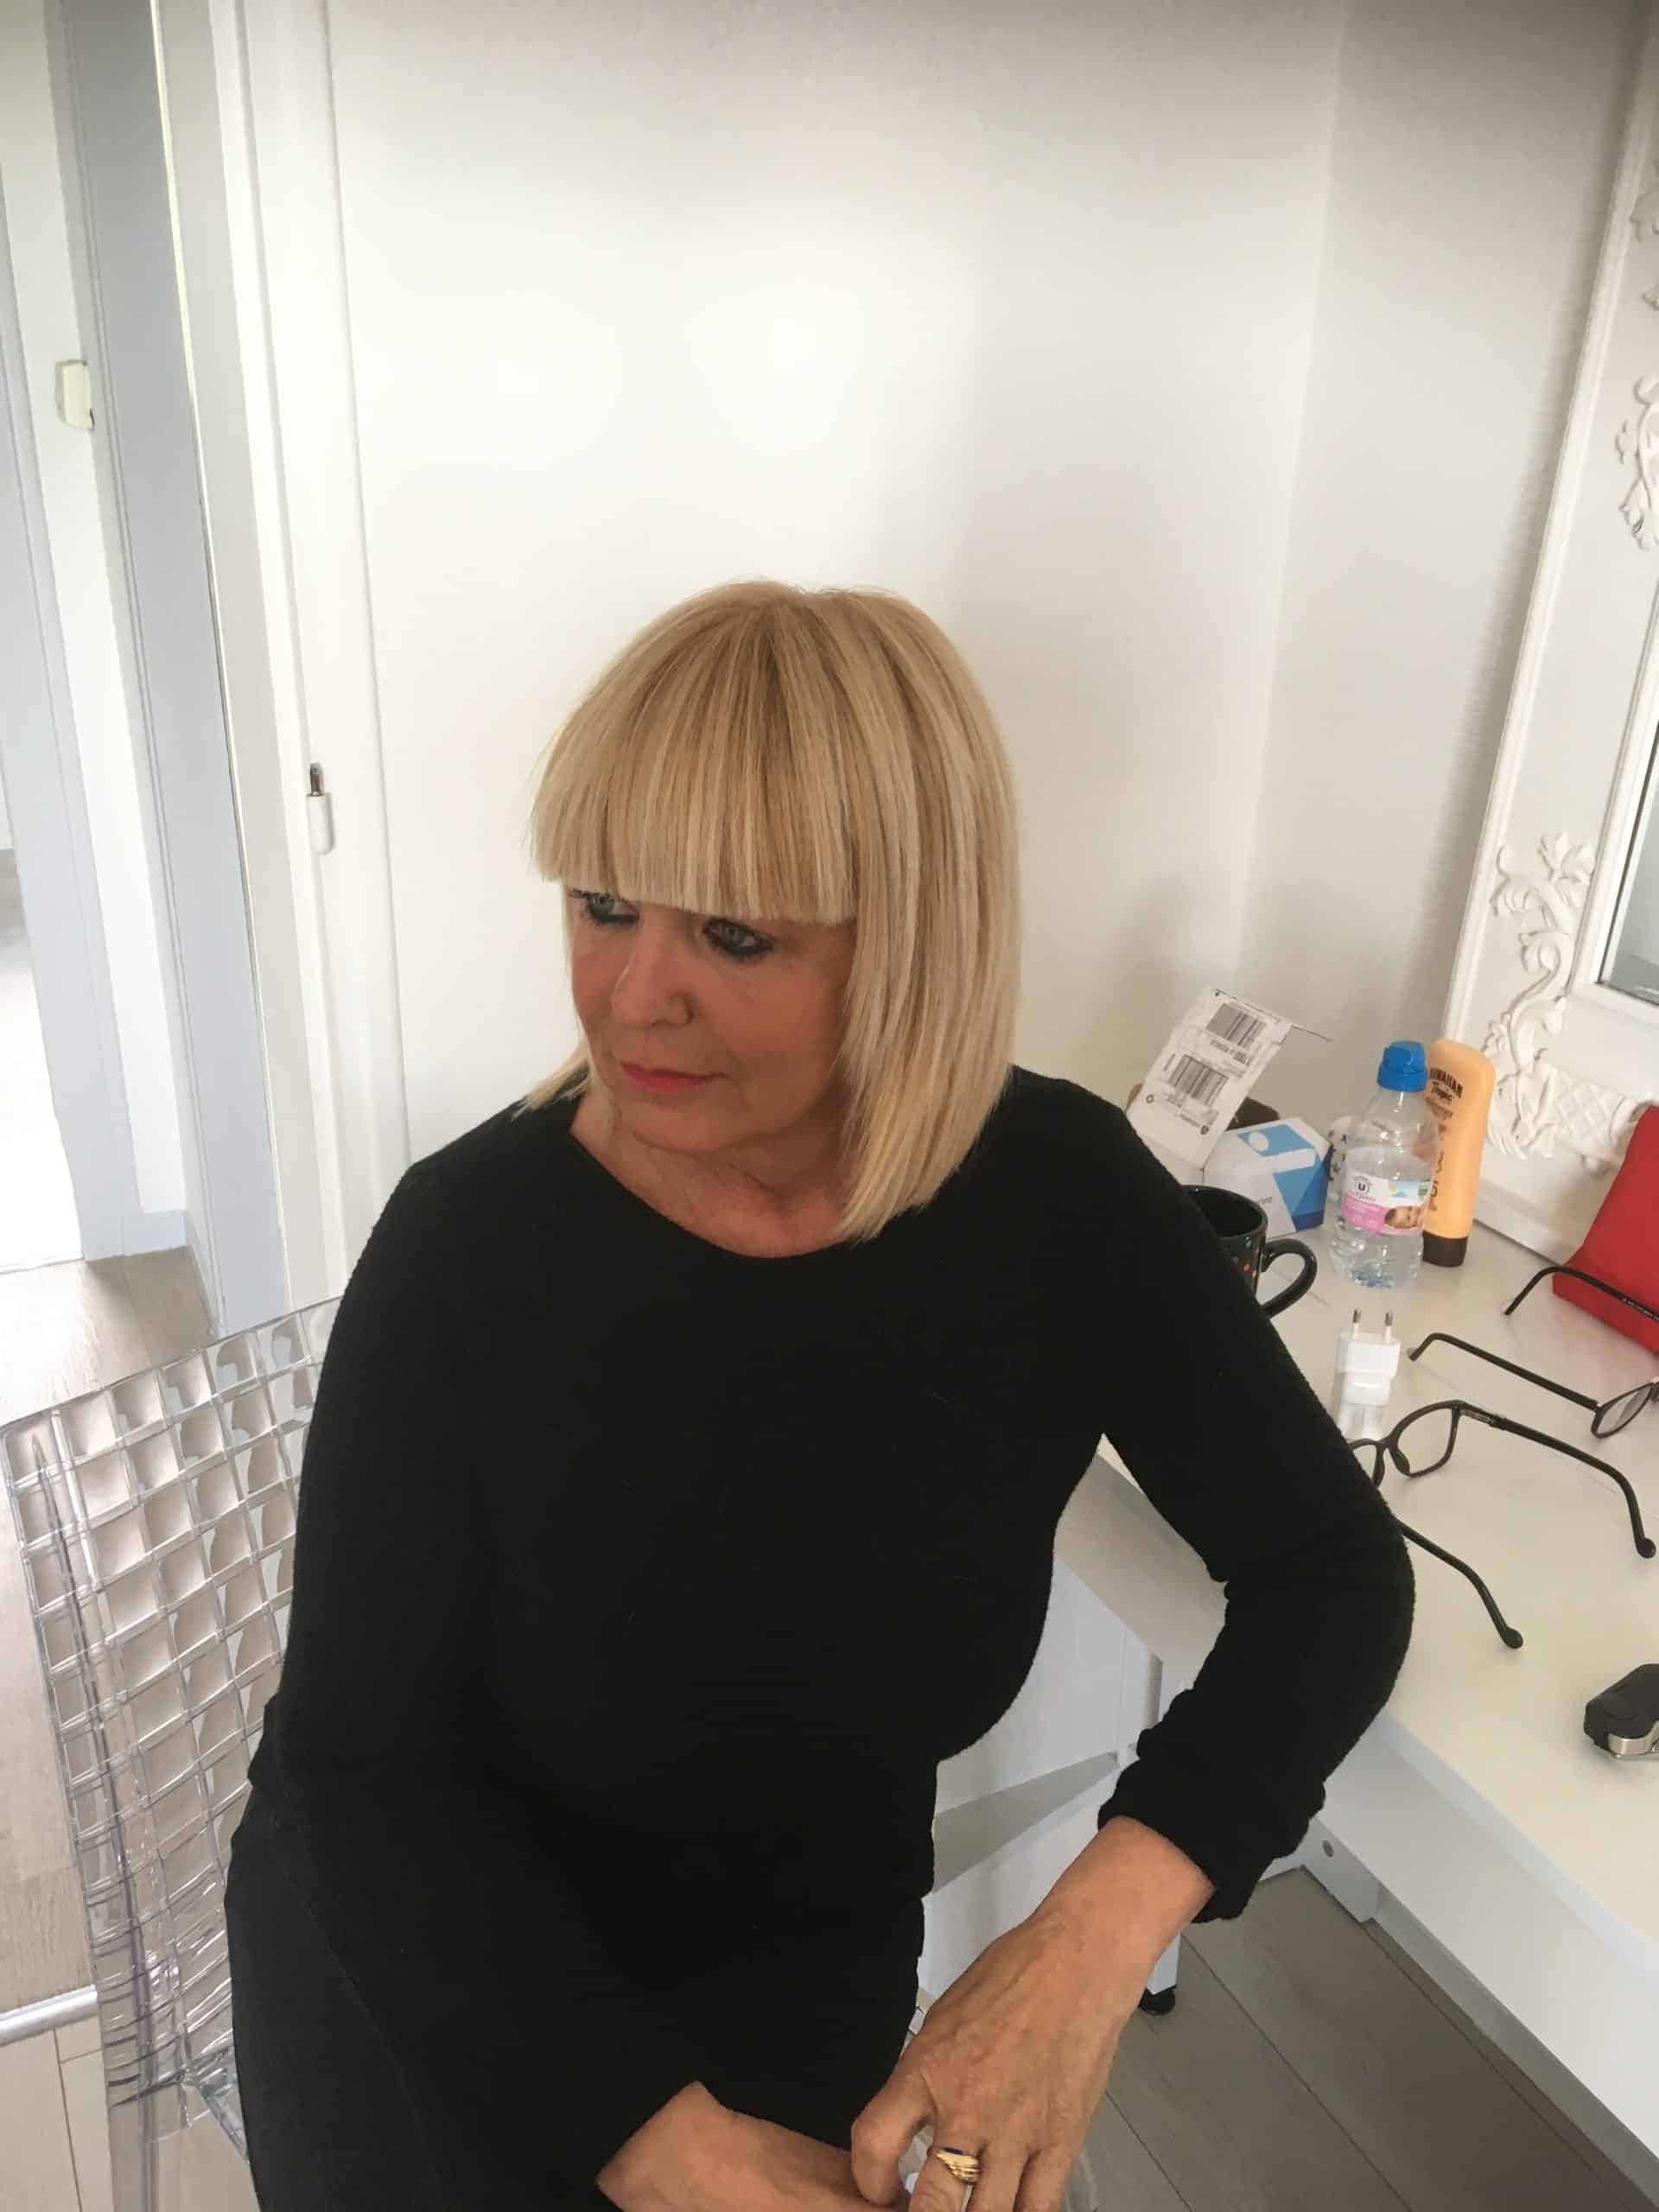 femme carré blond frange